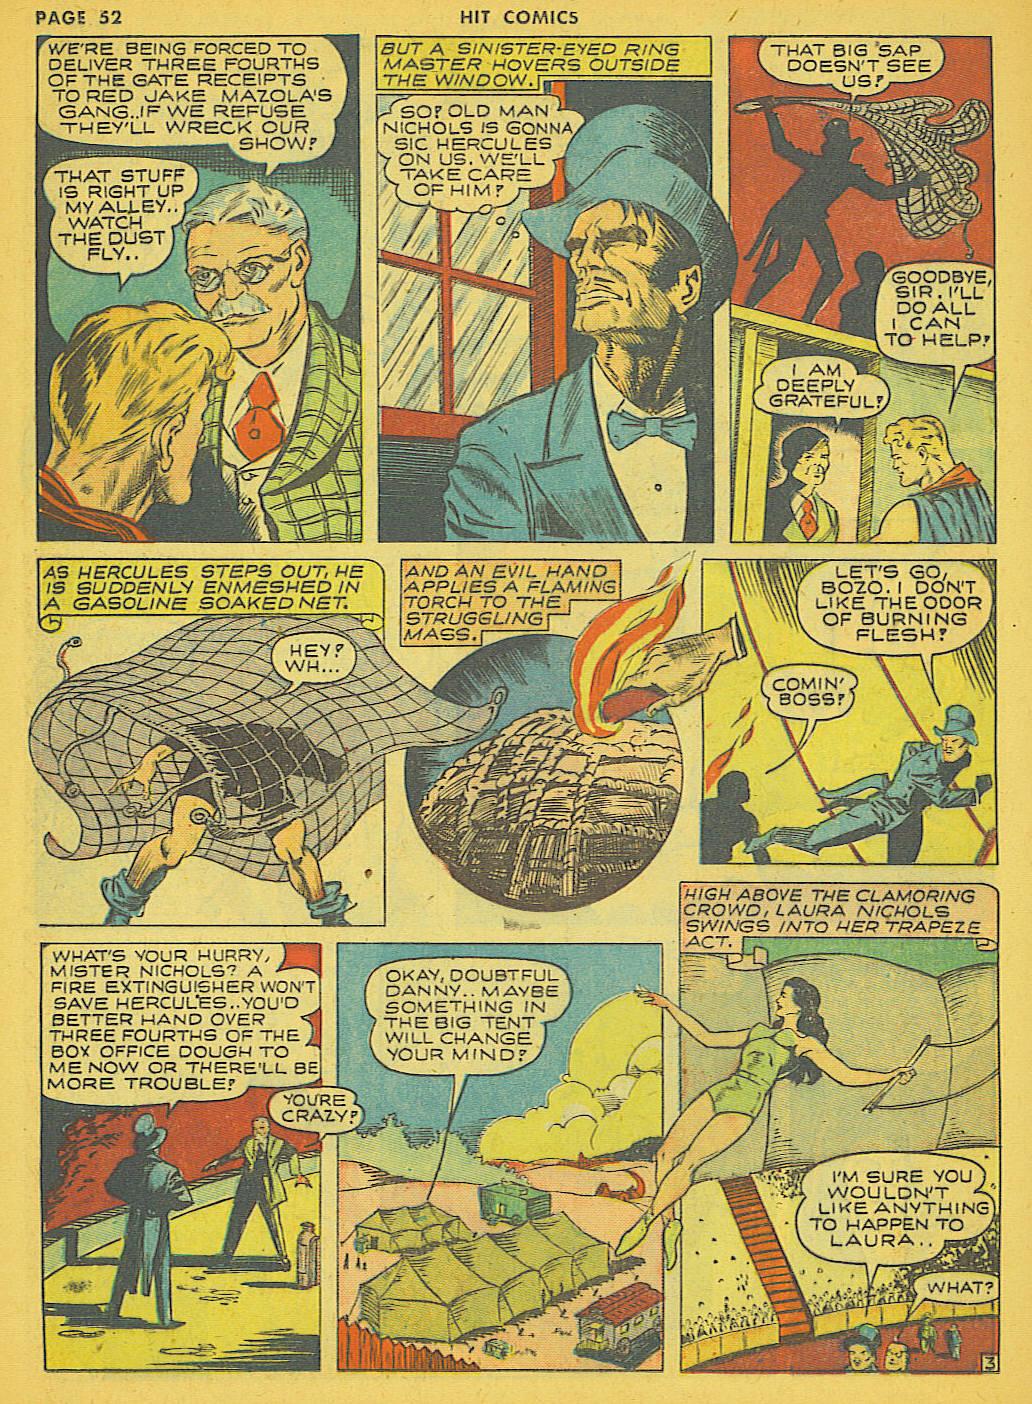 Read online Hit Comics comic -  Issue #21 - 54